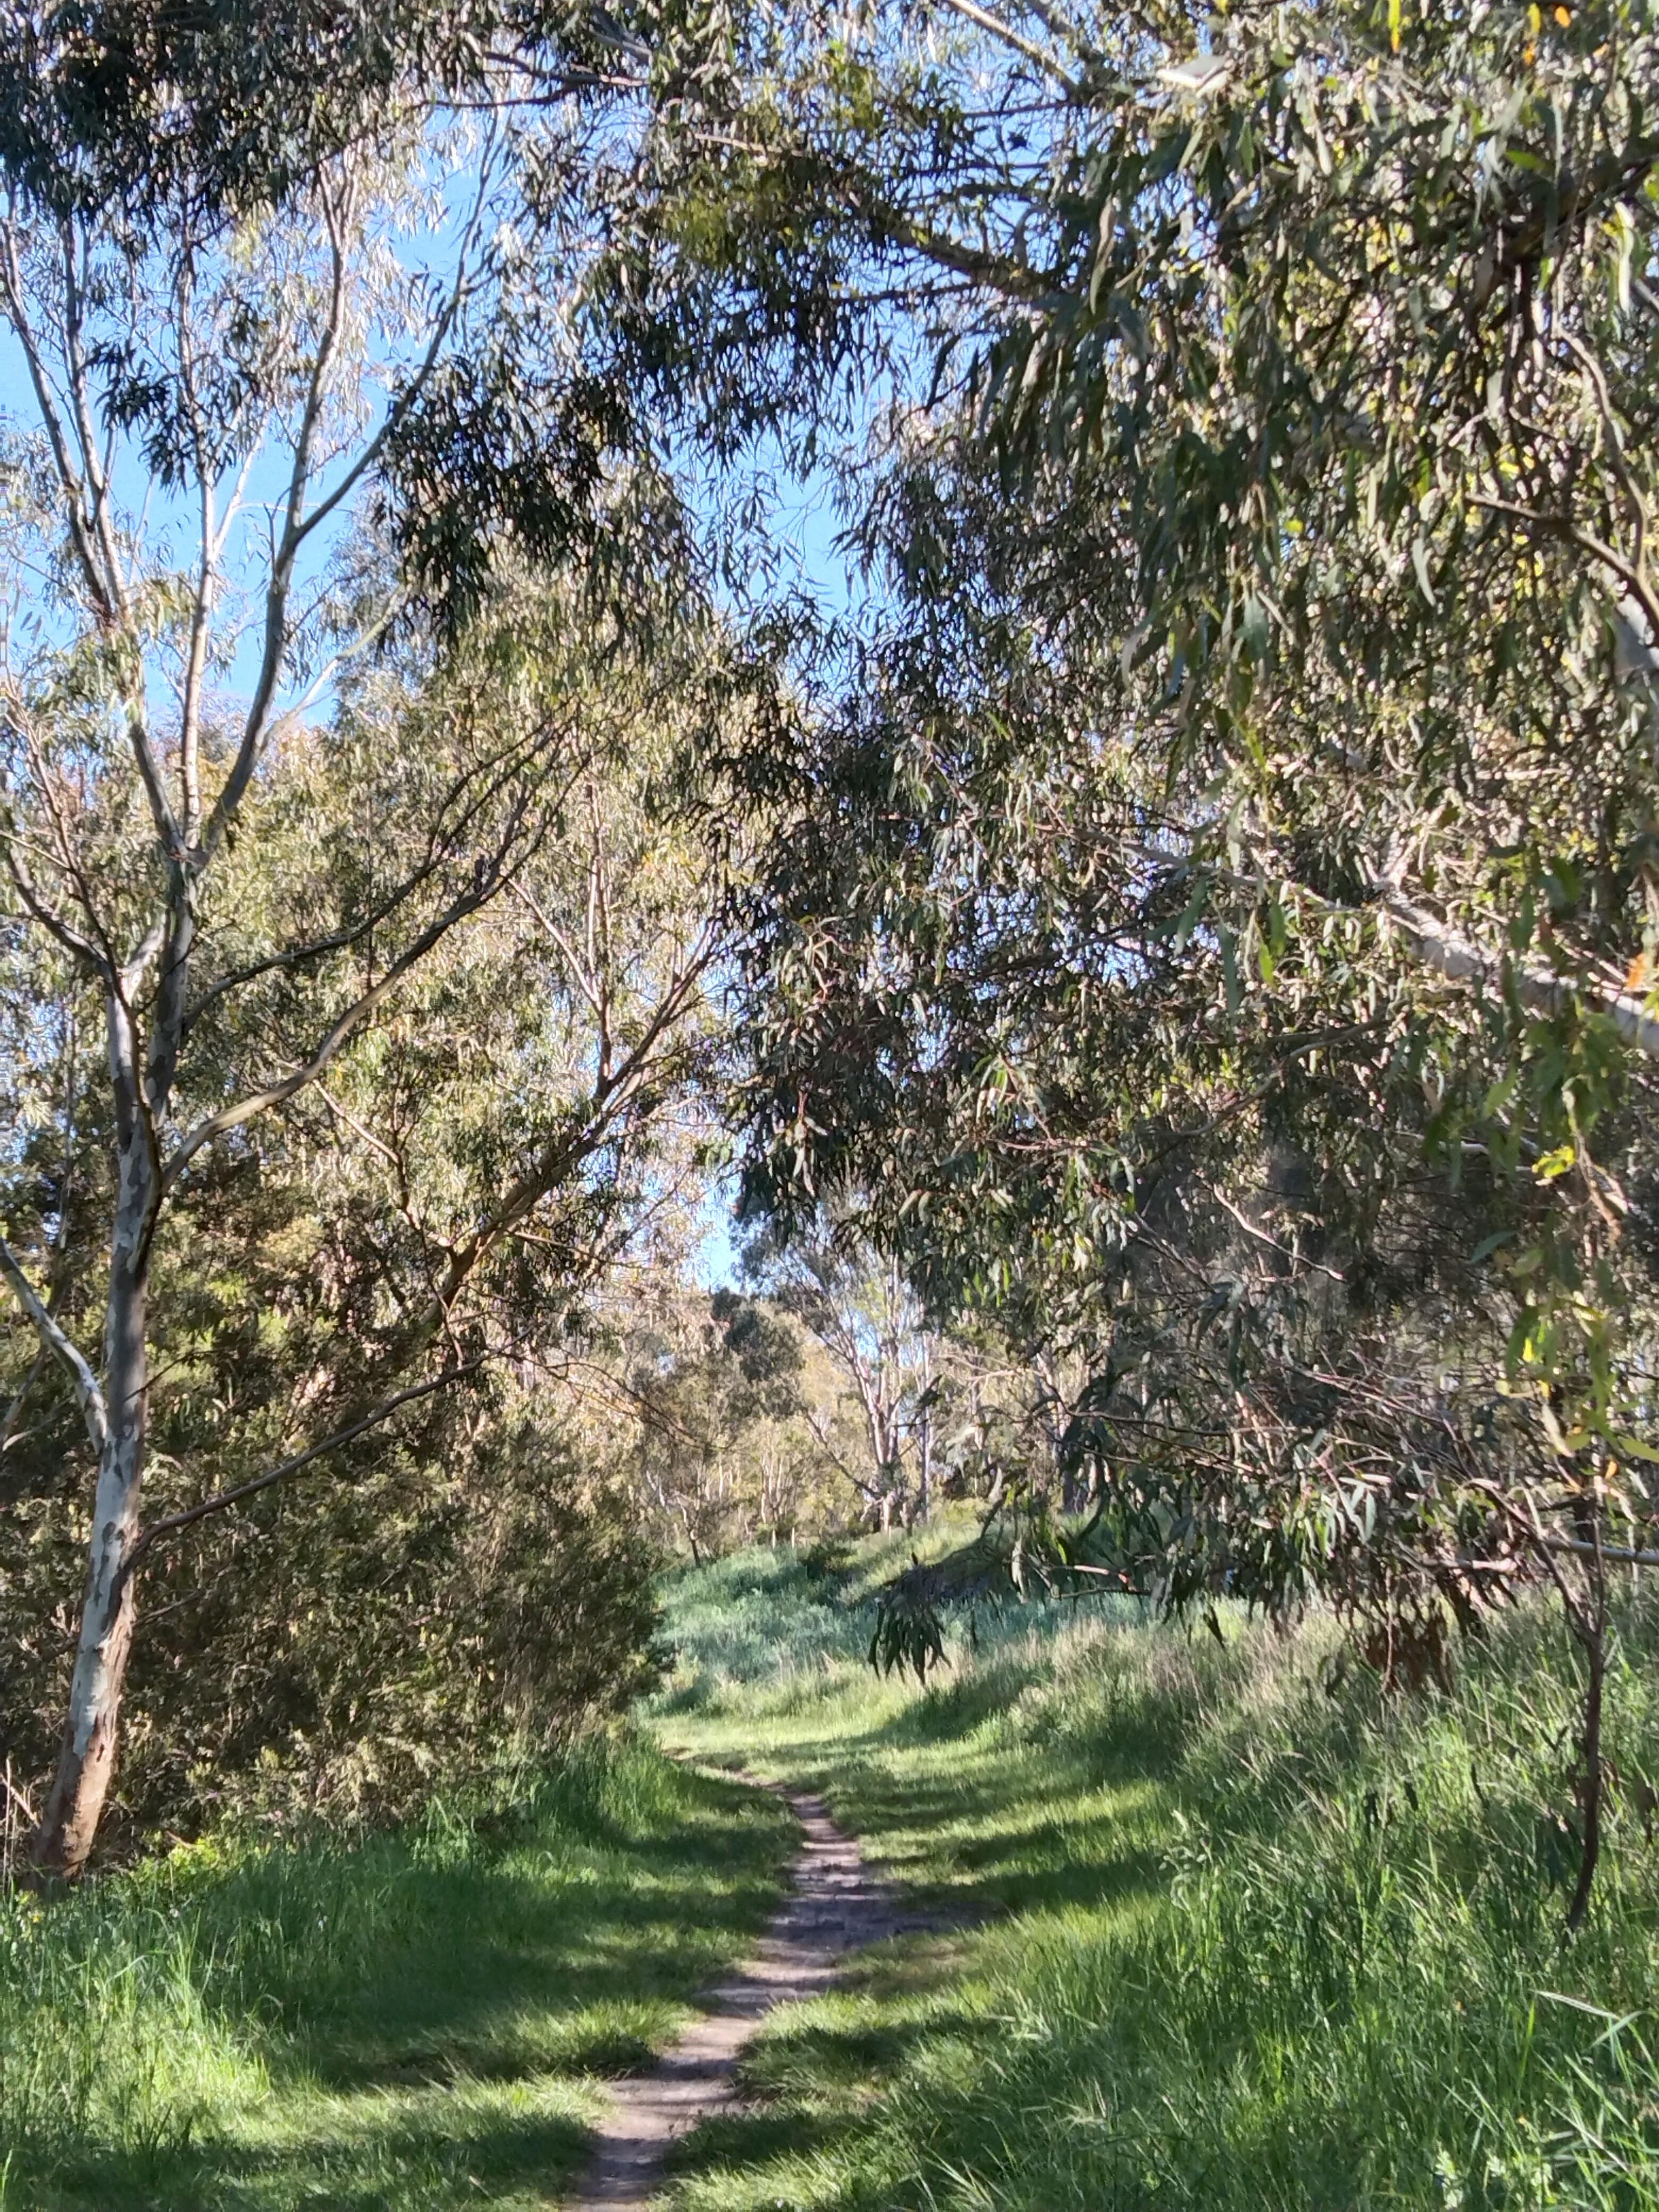 Track through bush